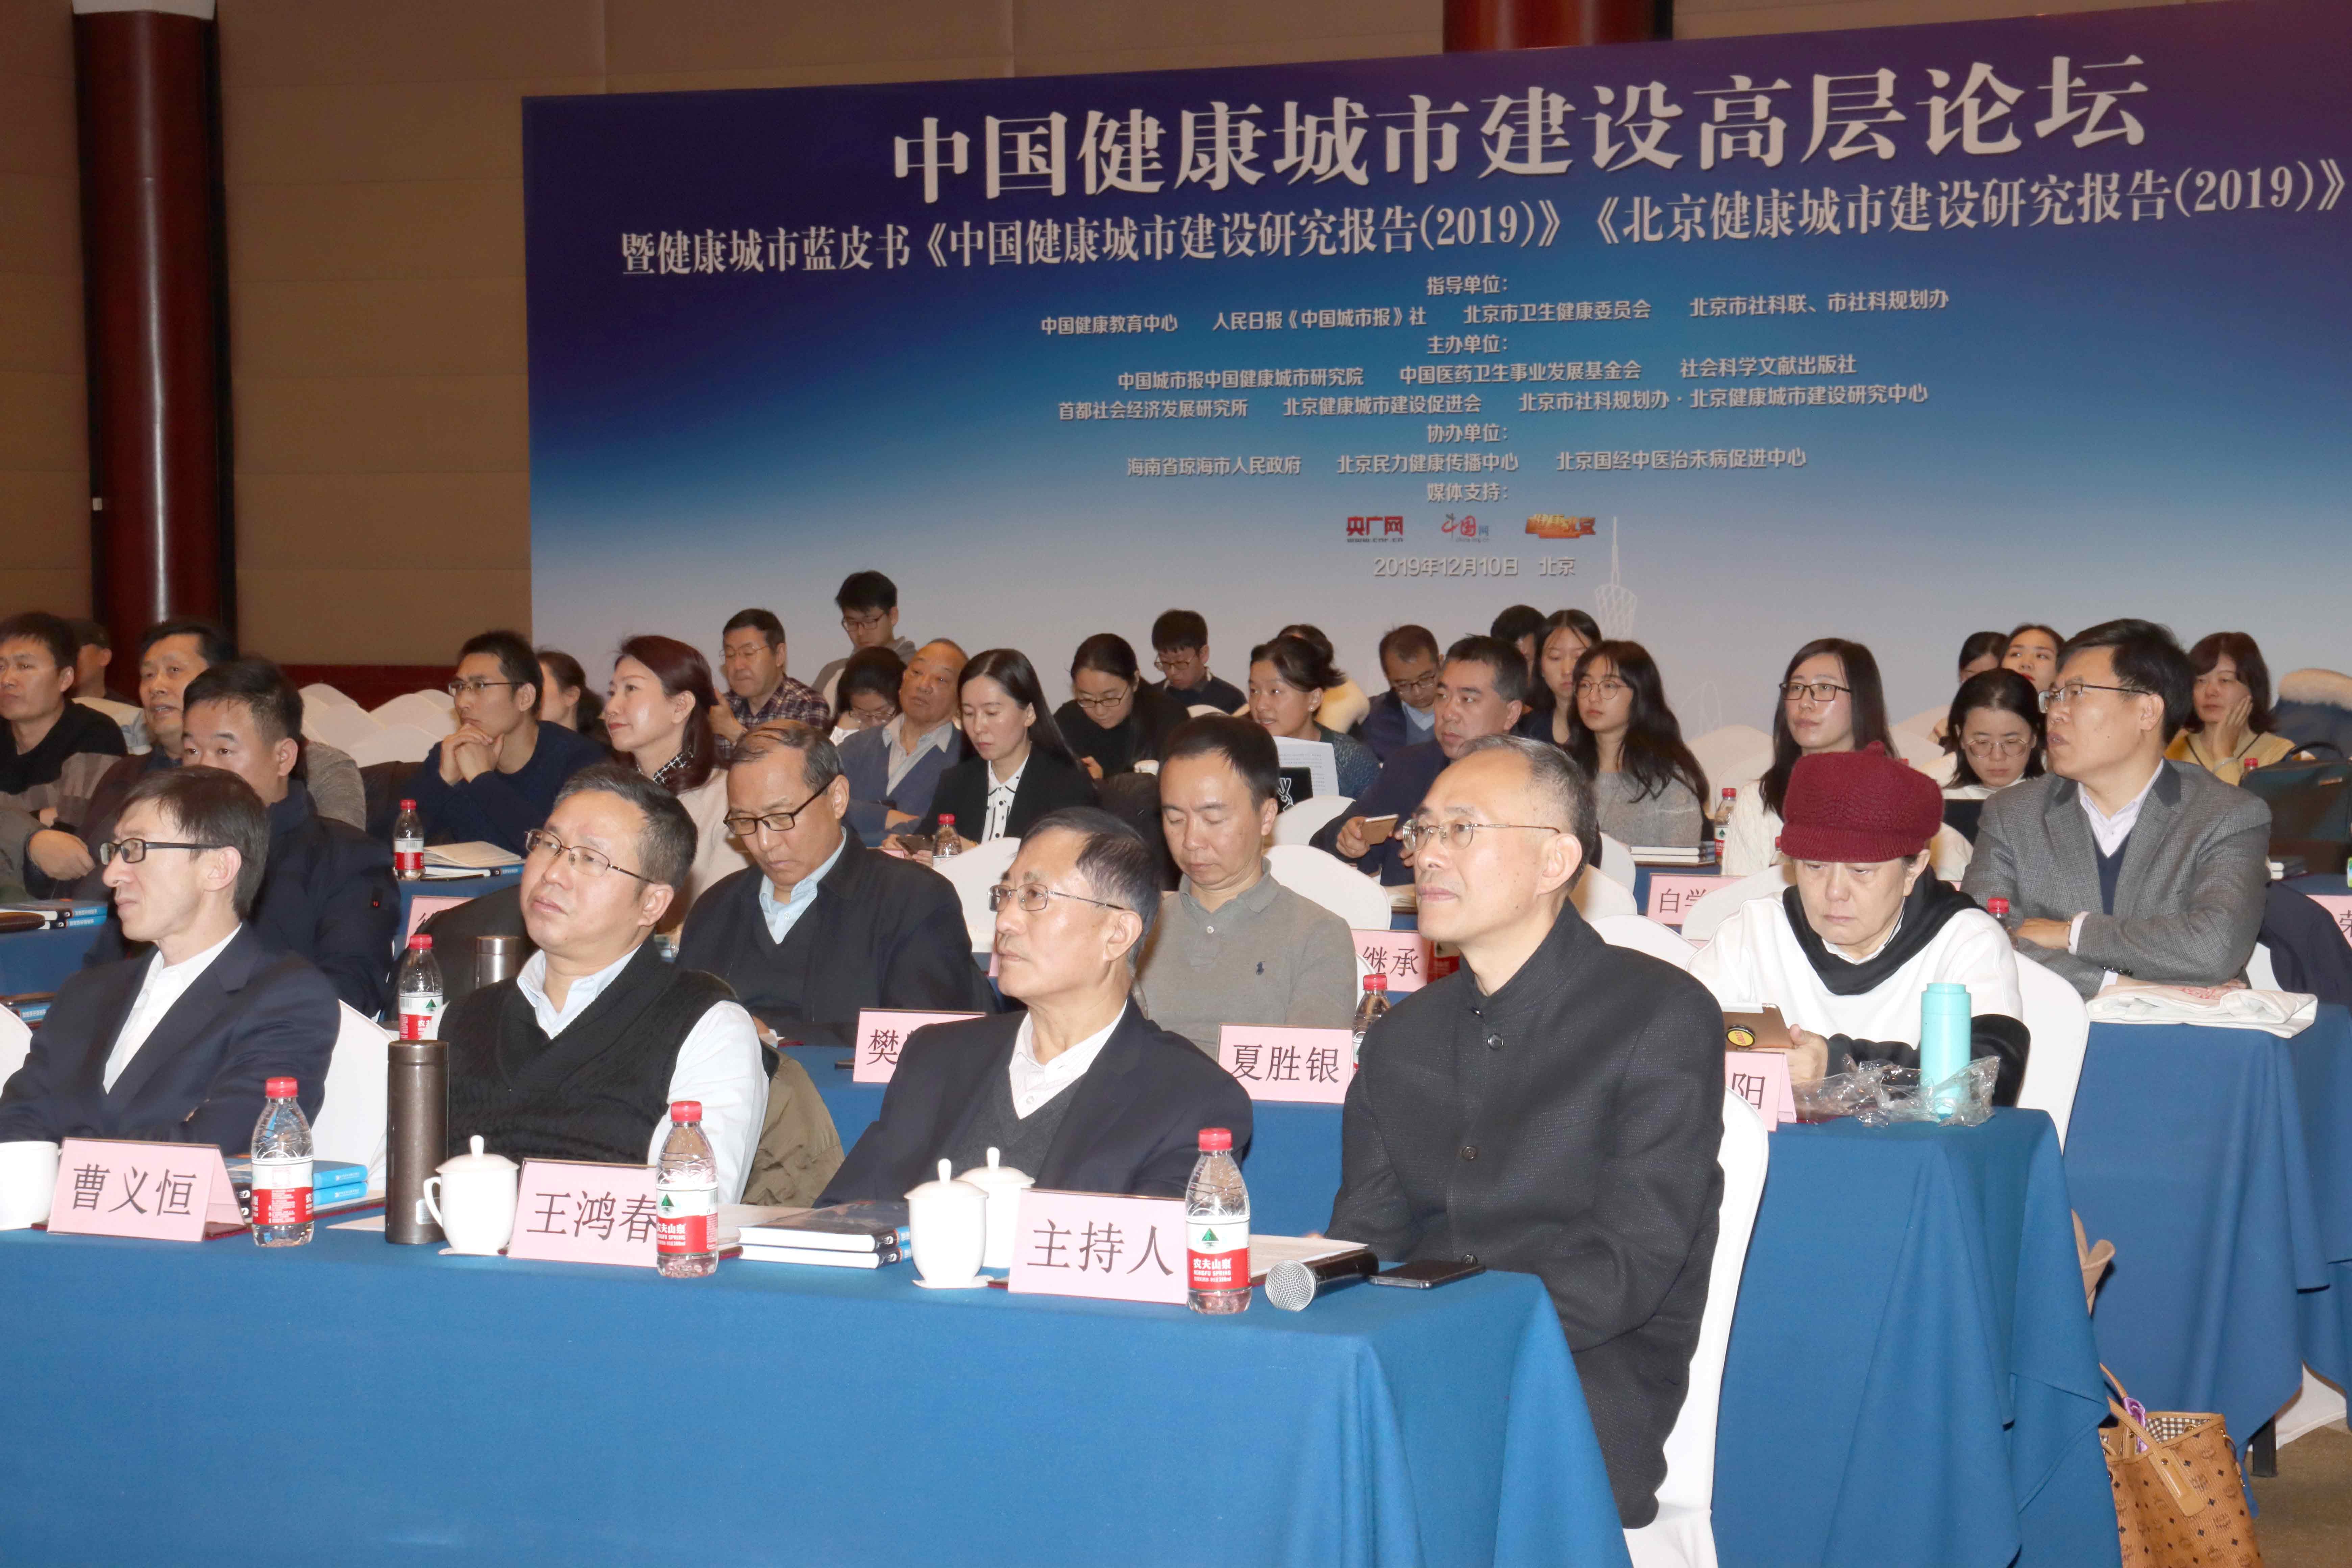 title='中国健康城市建设高层论坛暨健康城市蓝皮书《中国健康城市建设研究报告(2019)》《北京健康城市建设研究报告(2019)》发布会召开'